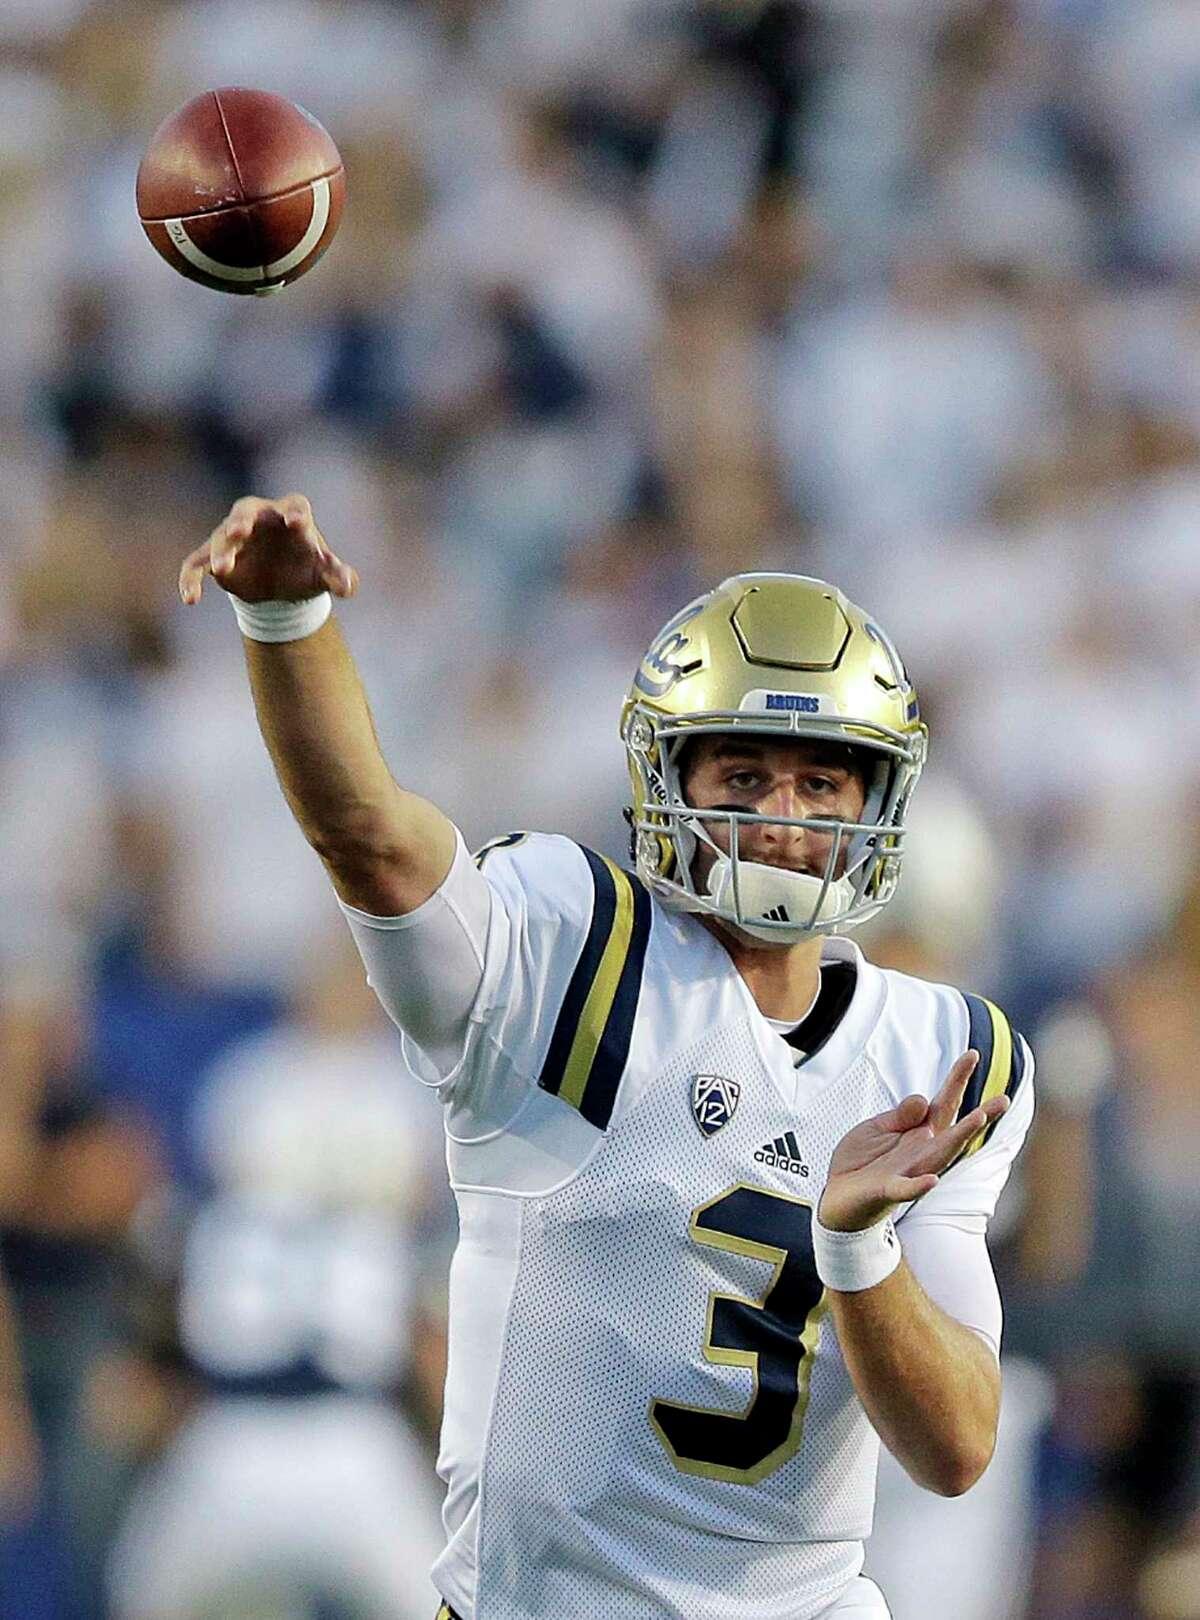 UCLA quarterback Josh Rosen (3) throws before the start of their NCAA college football game against BYU Saturday, Sept. 17, 2016, in Provo, Utah. (AP Photo/Rick Bowmer)